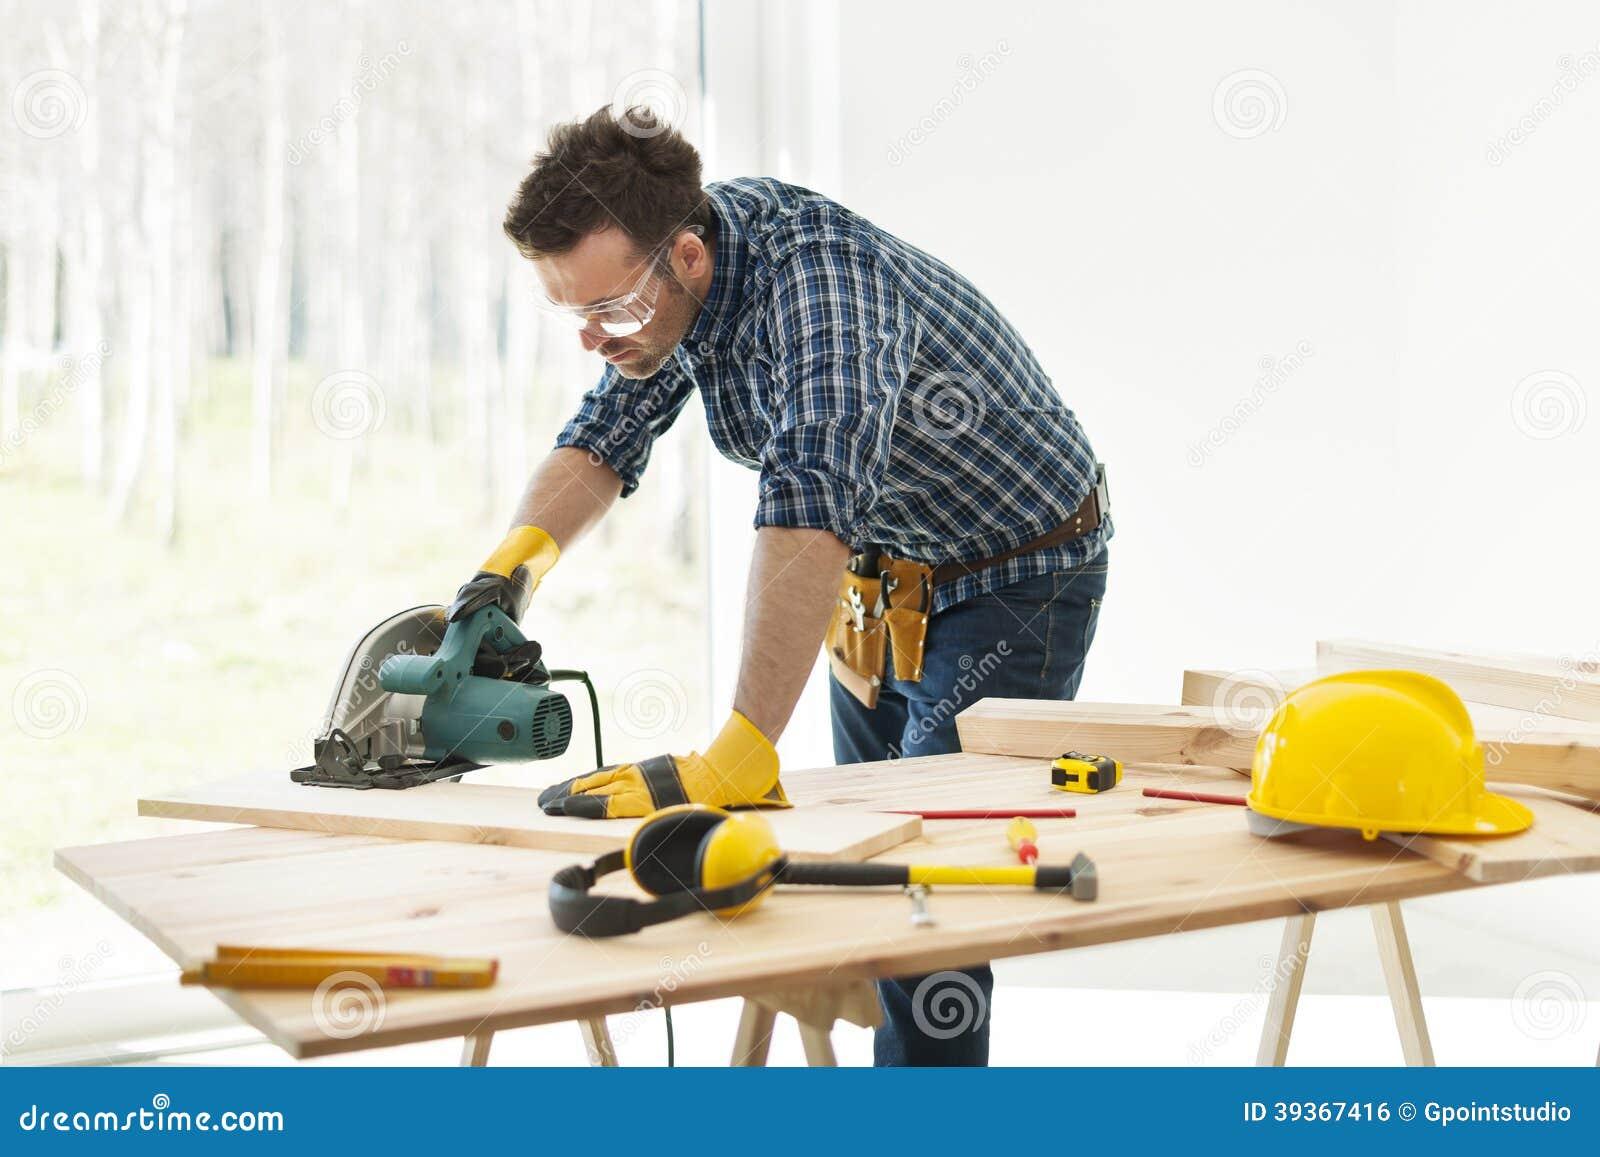 Carpenter At Work Stock Photo Image 39367416